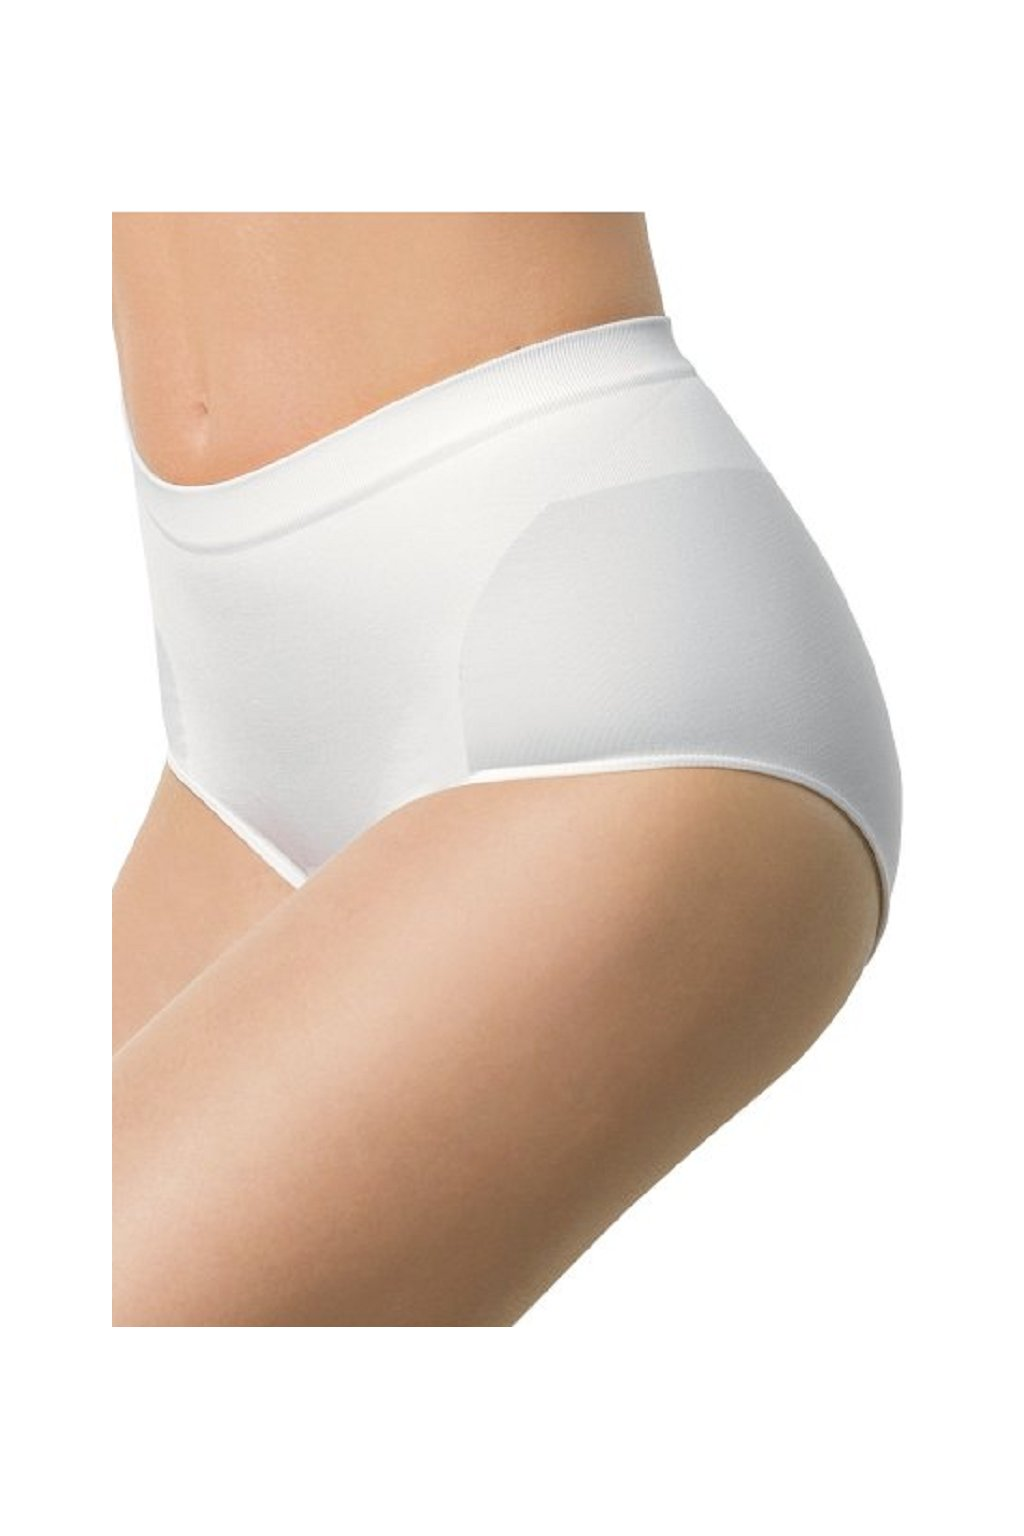 Dámské kalhotky Intimidea silhouette 310473 bílá